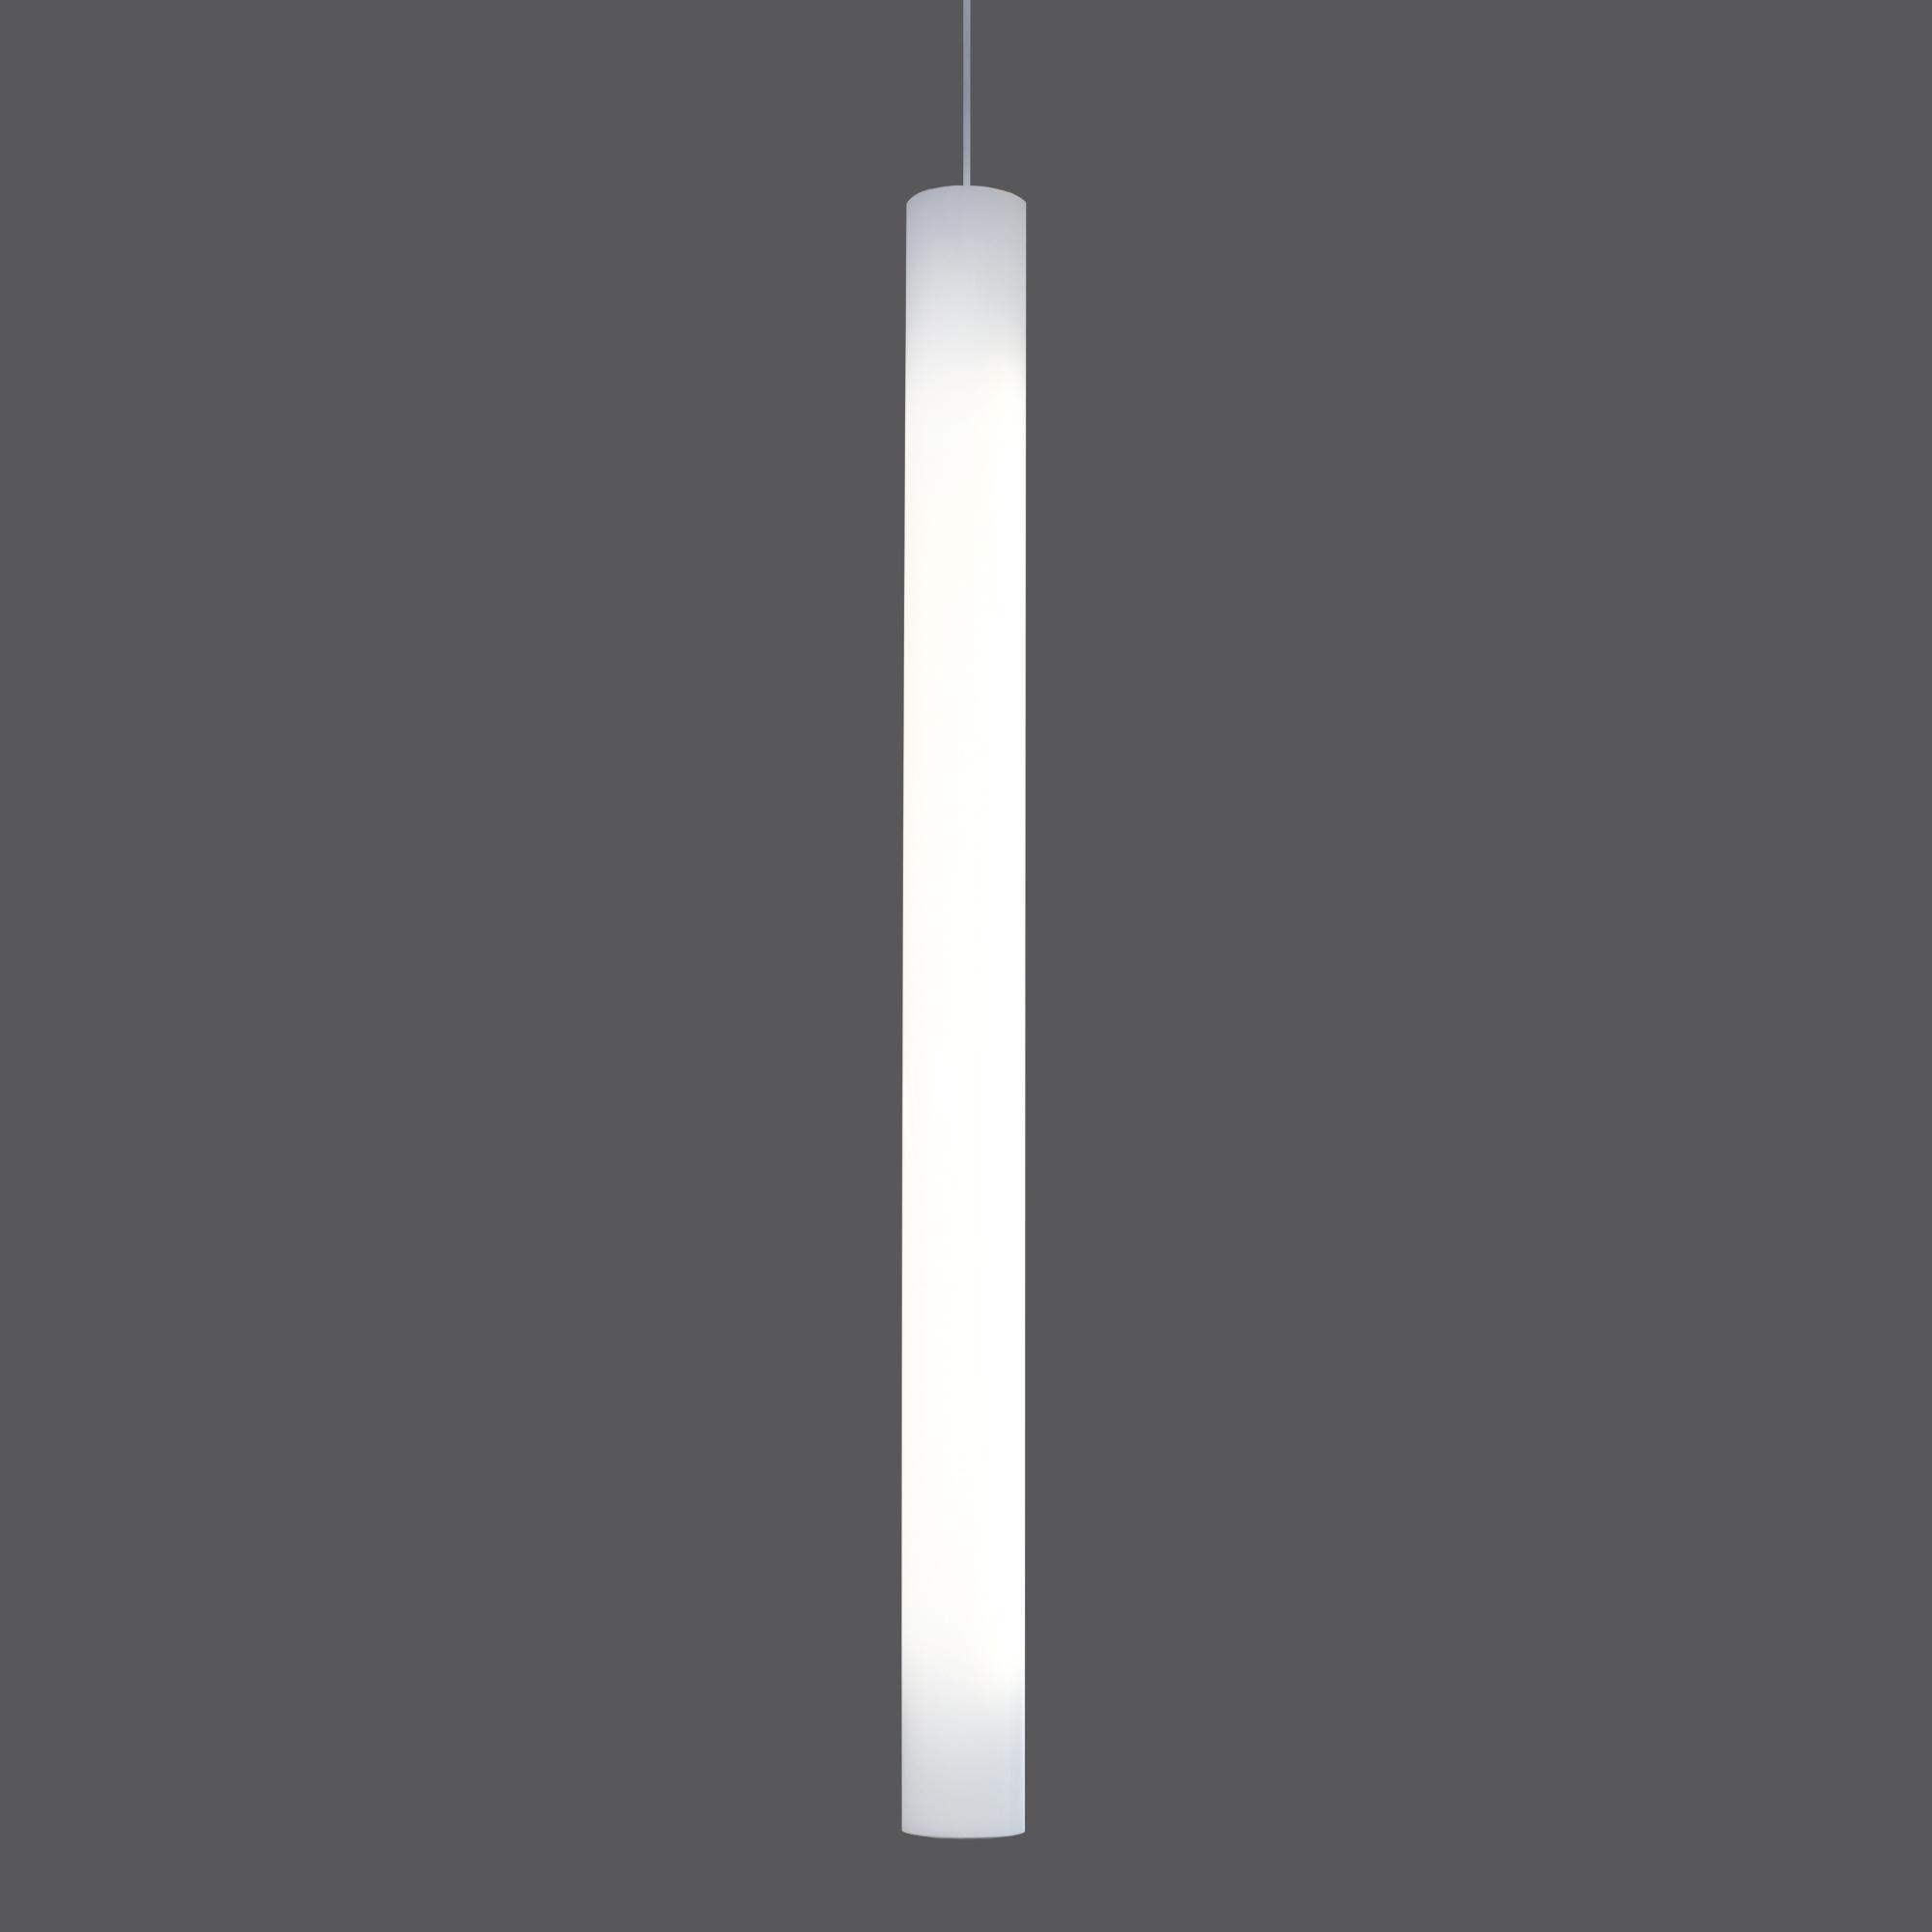 Delray Lighting Llc 6300 Series 4 Light